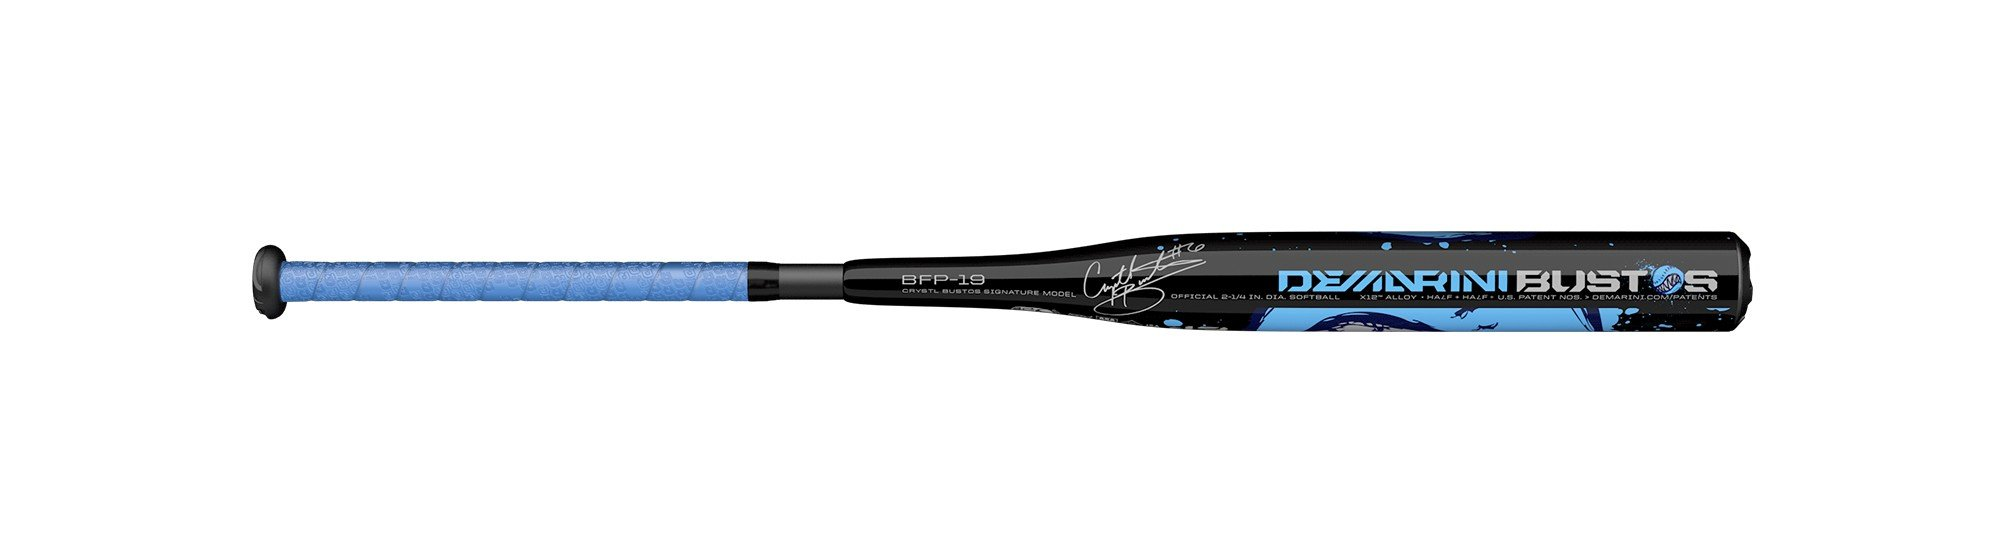 DeMarini 2019 Bustos (-13) 2 1/4'' Fastpitch Bat, 29''/16 oz by DeMarini (Image #4)